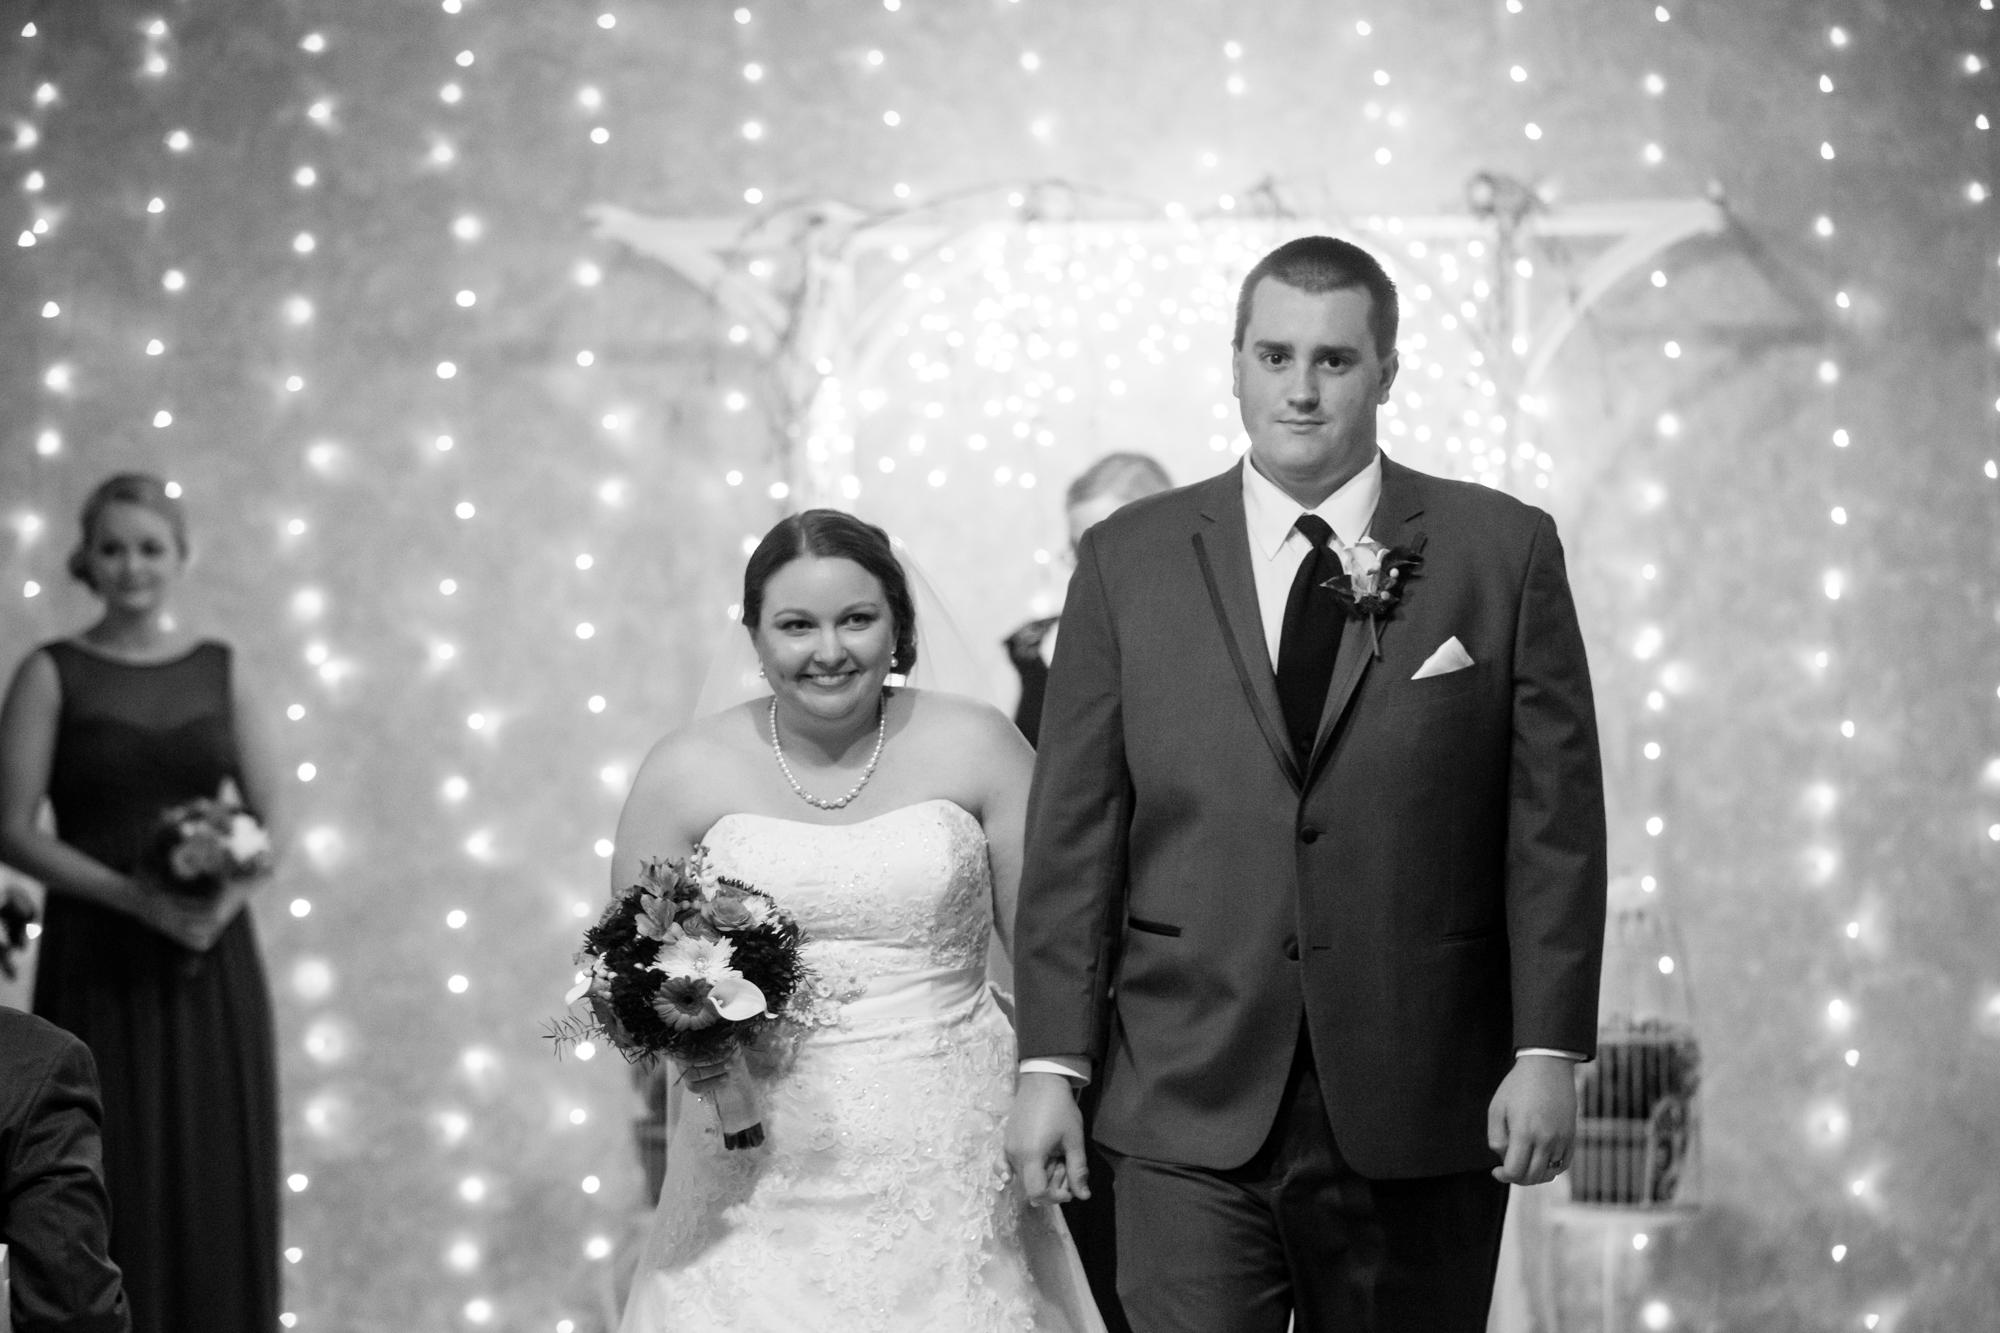 Fox Hills Resort Wedding Mishicot Wisconsin - Green Bay Wedding Photographer - Whit Meza Photography